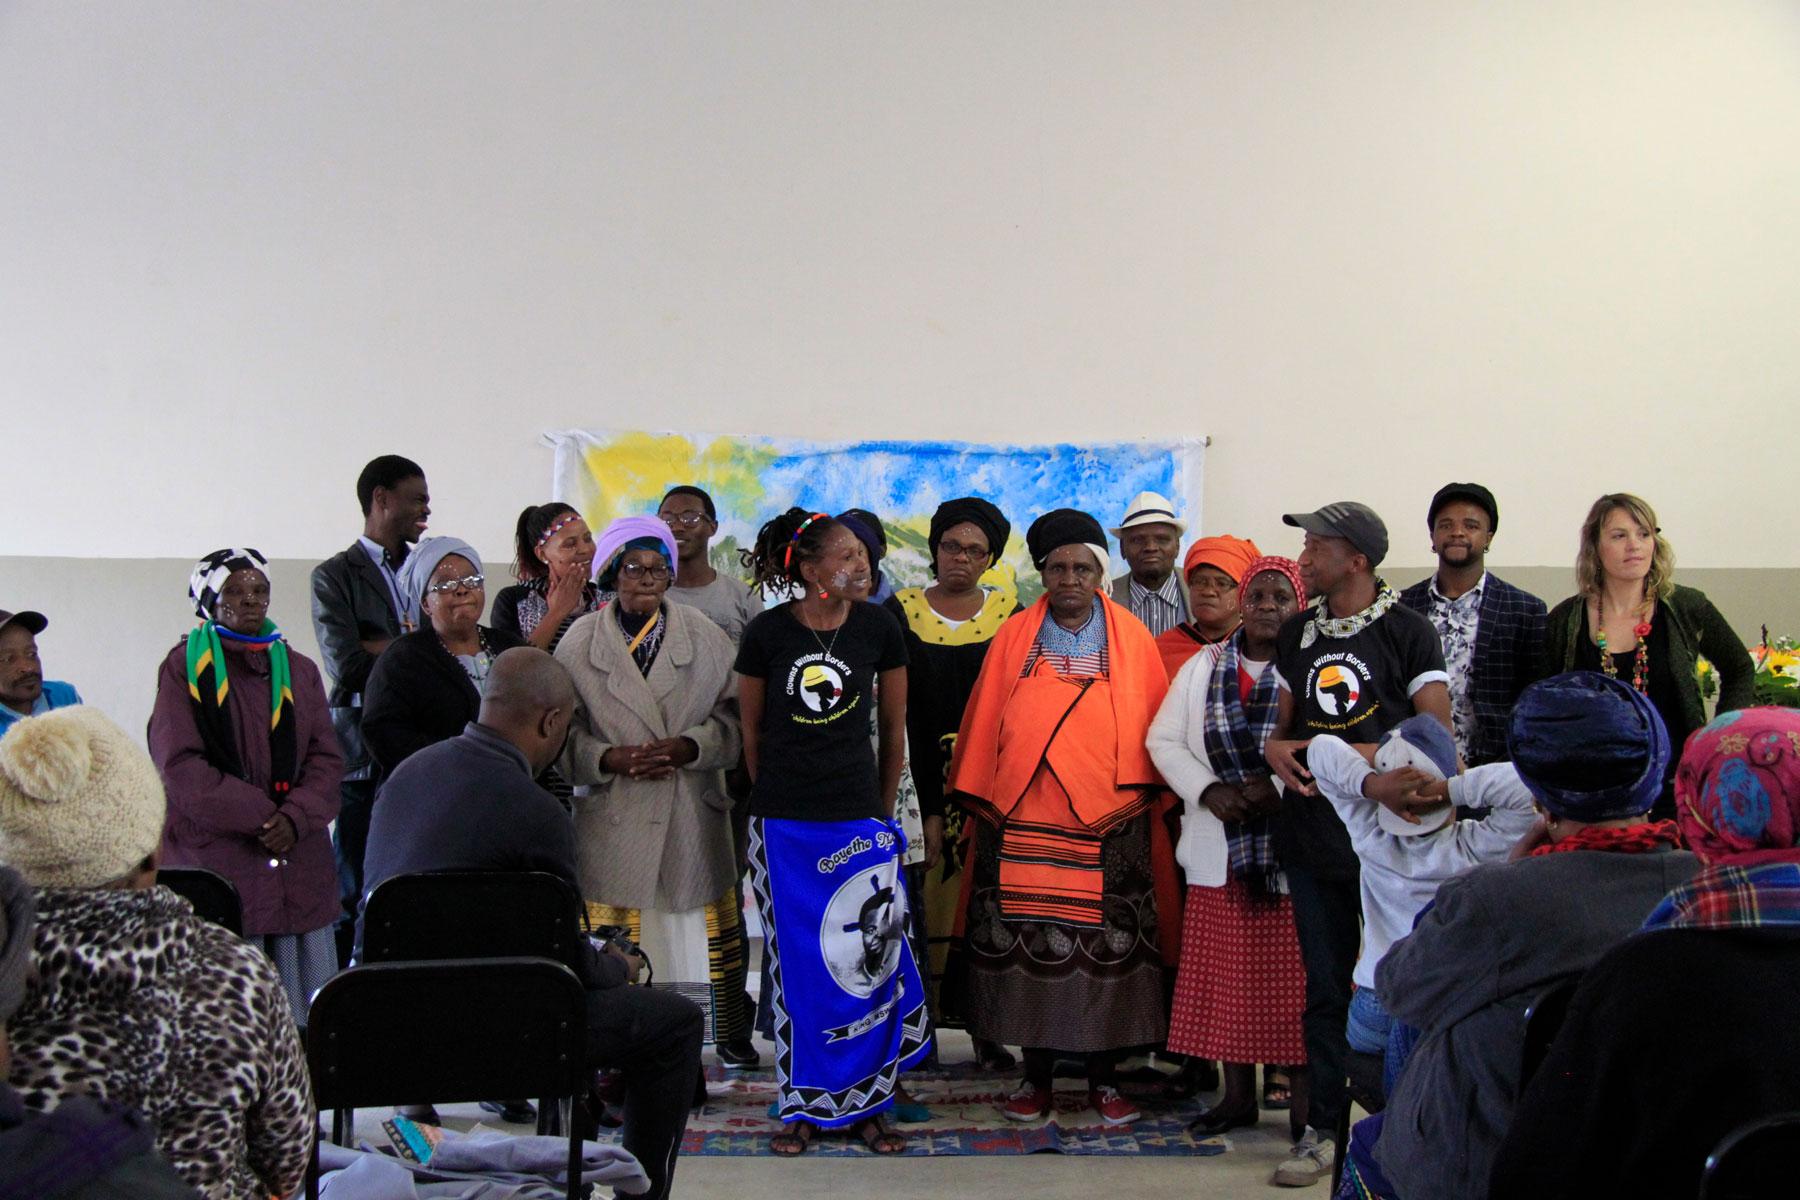 MAIN-PIC-community-event-Khayelitsha-2016